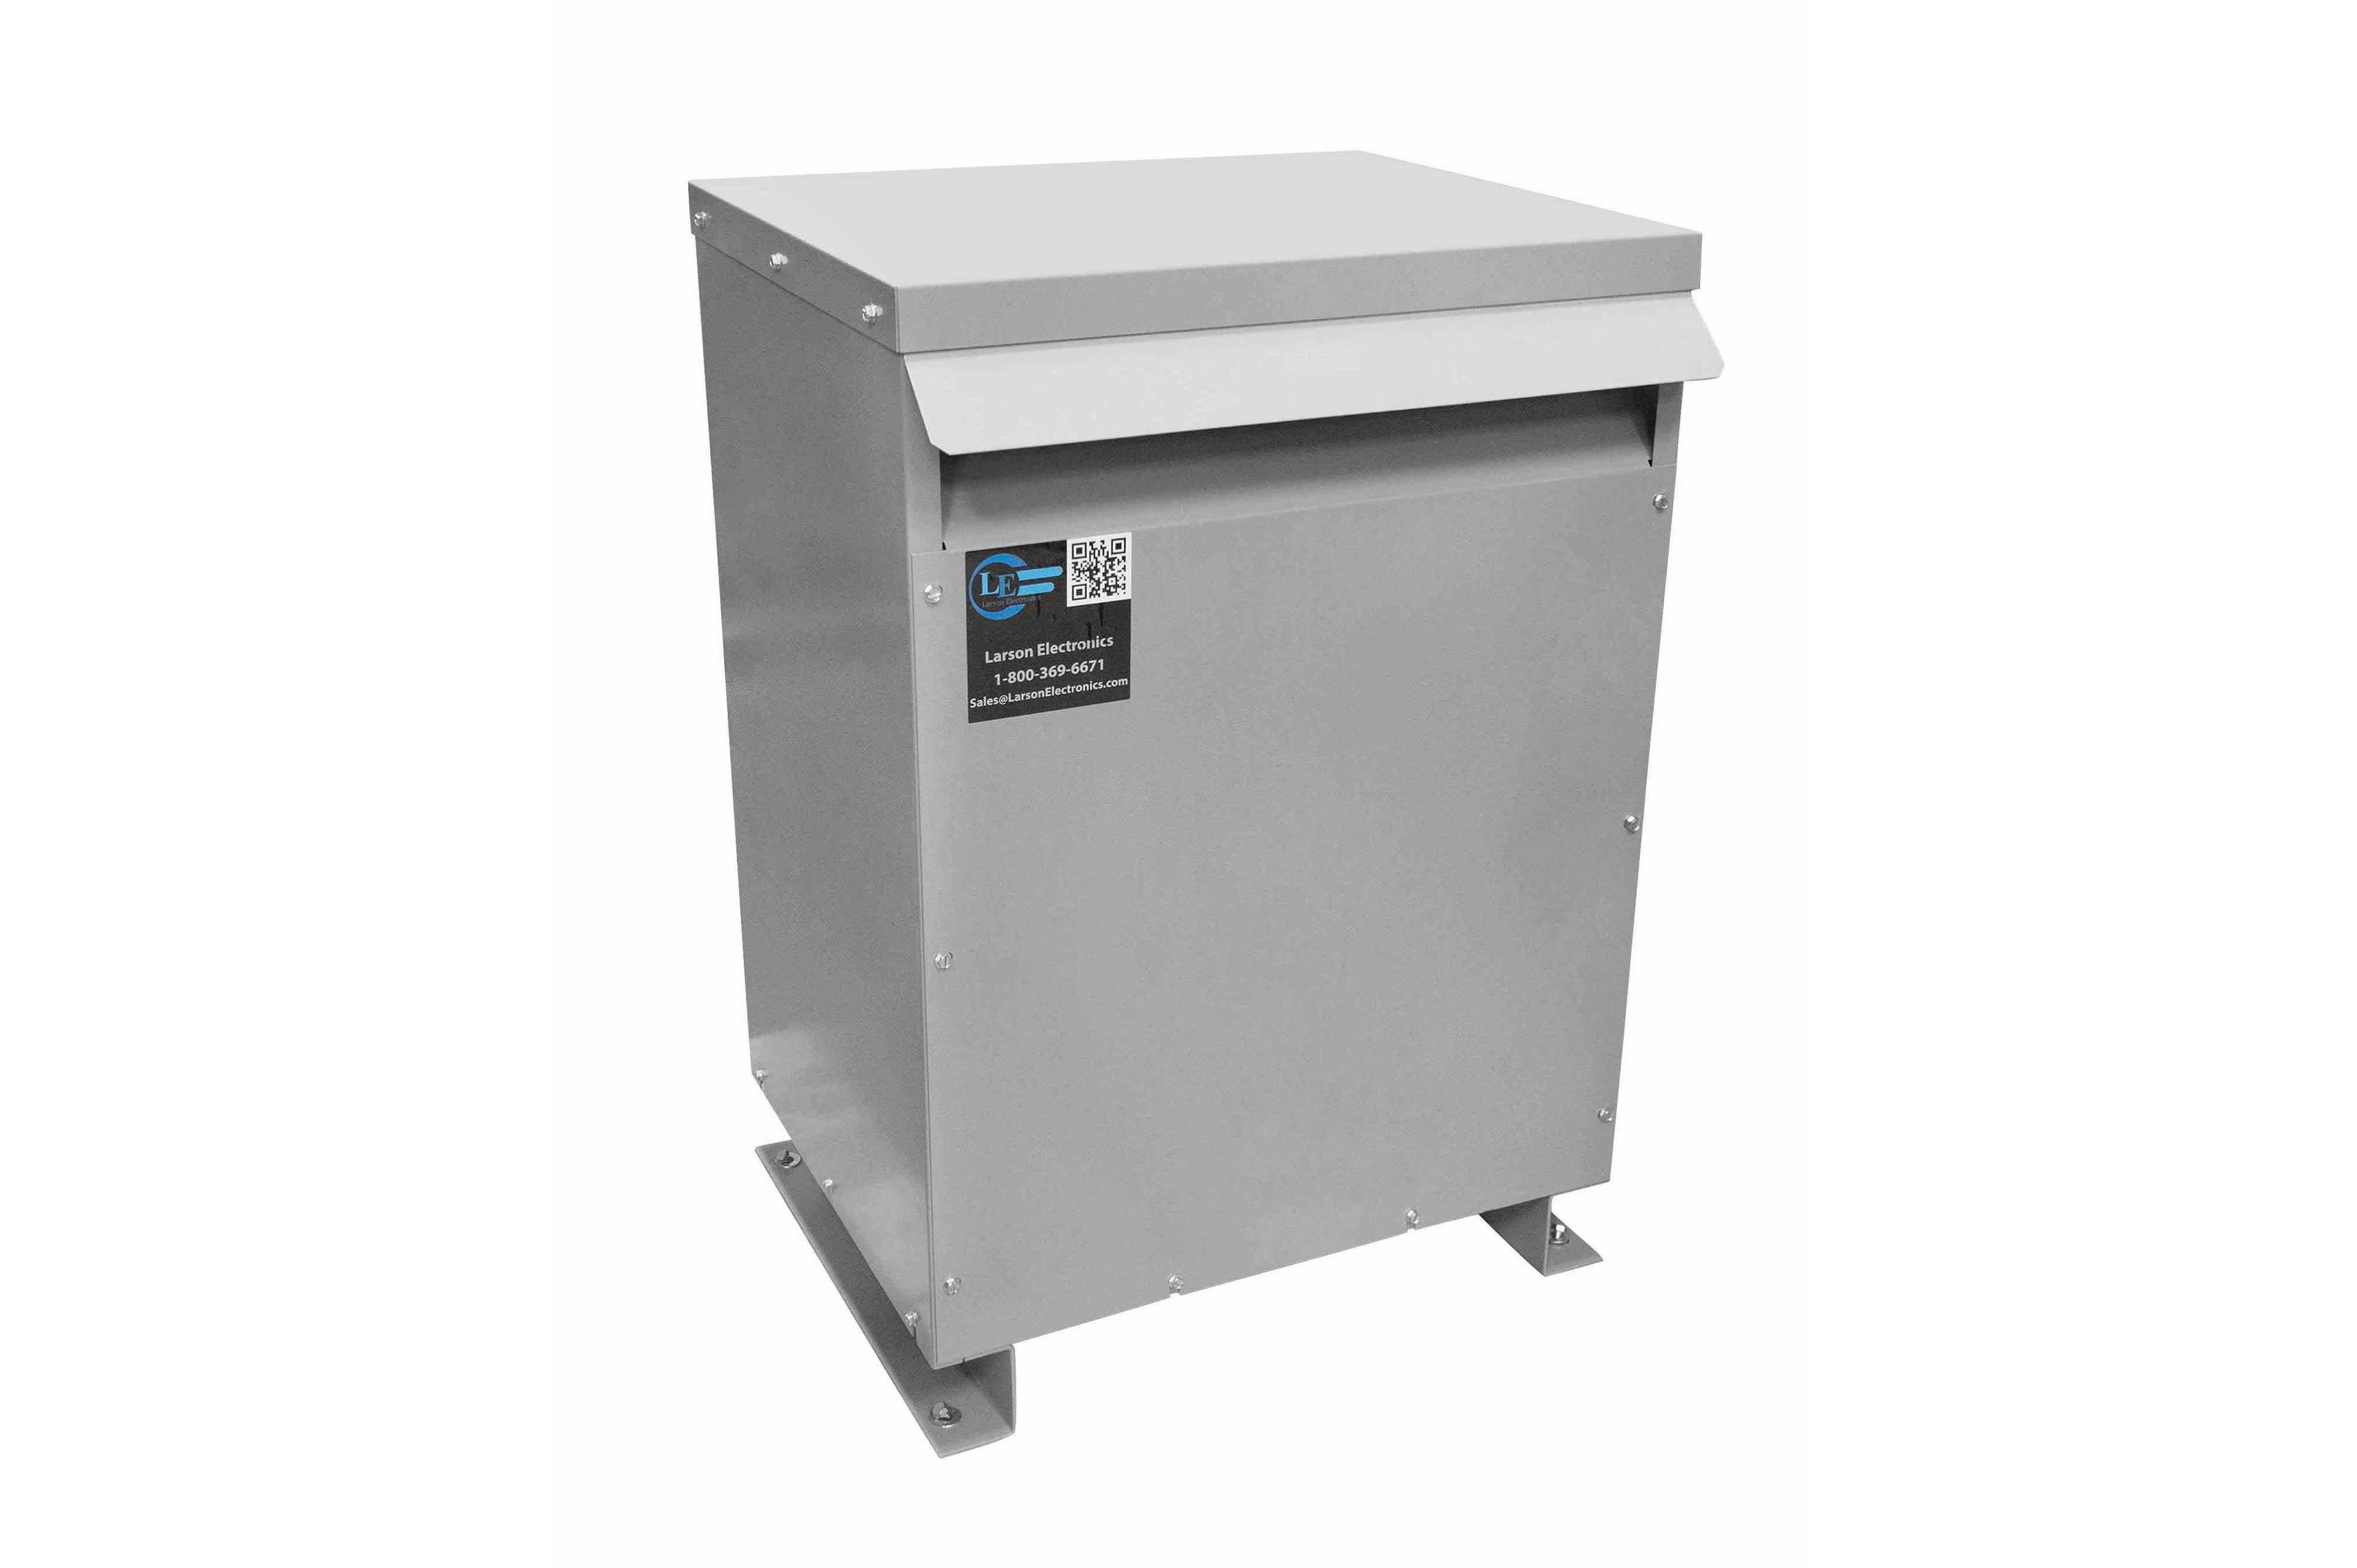 300 kVA 3PH Isolation Transformer, 600V Wye Primary, 460V Delta Secondary, N3R, Ventilated, 60 Hz